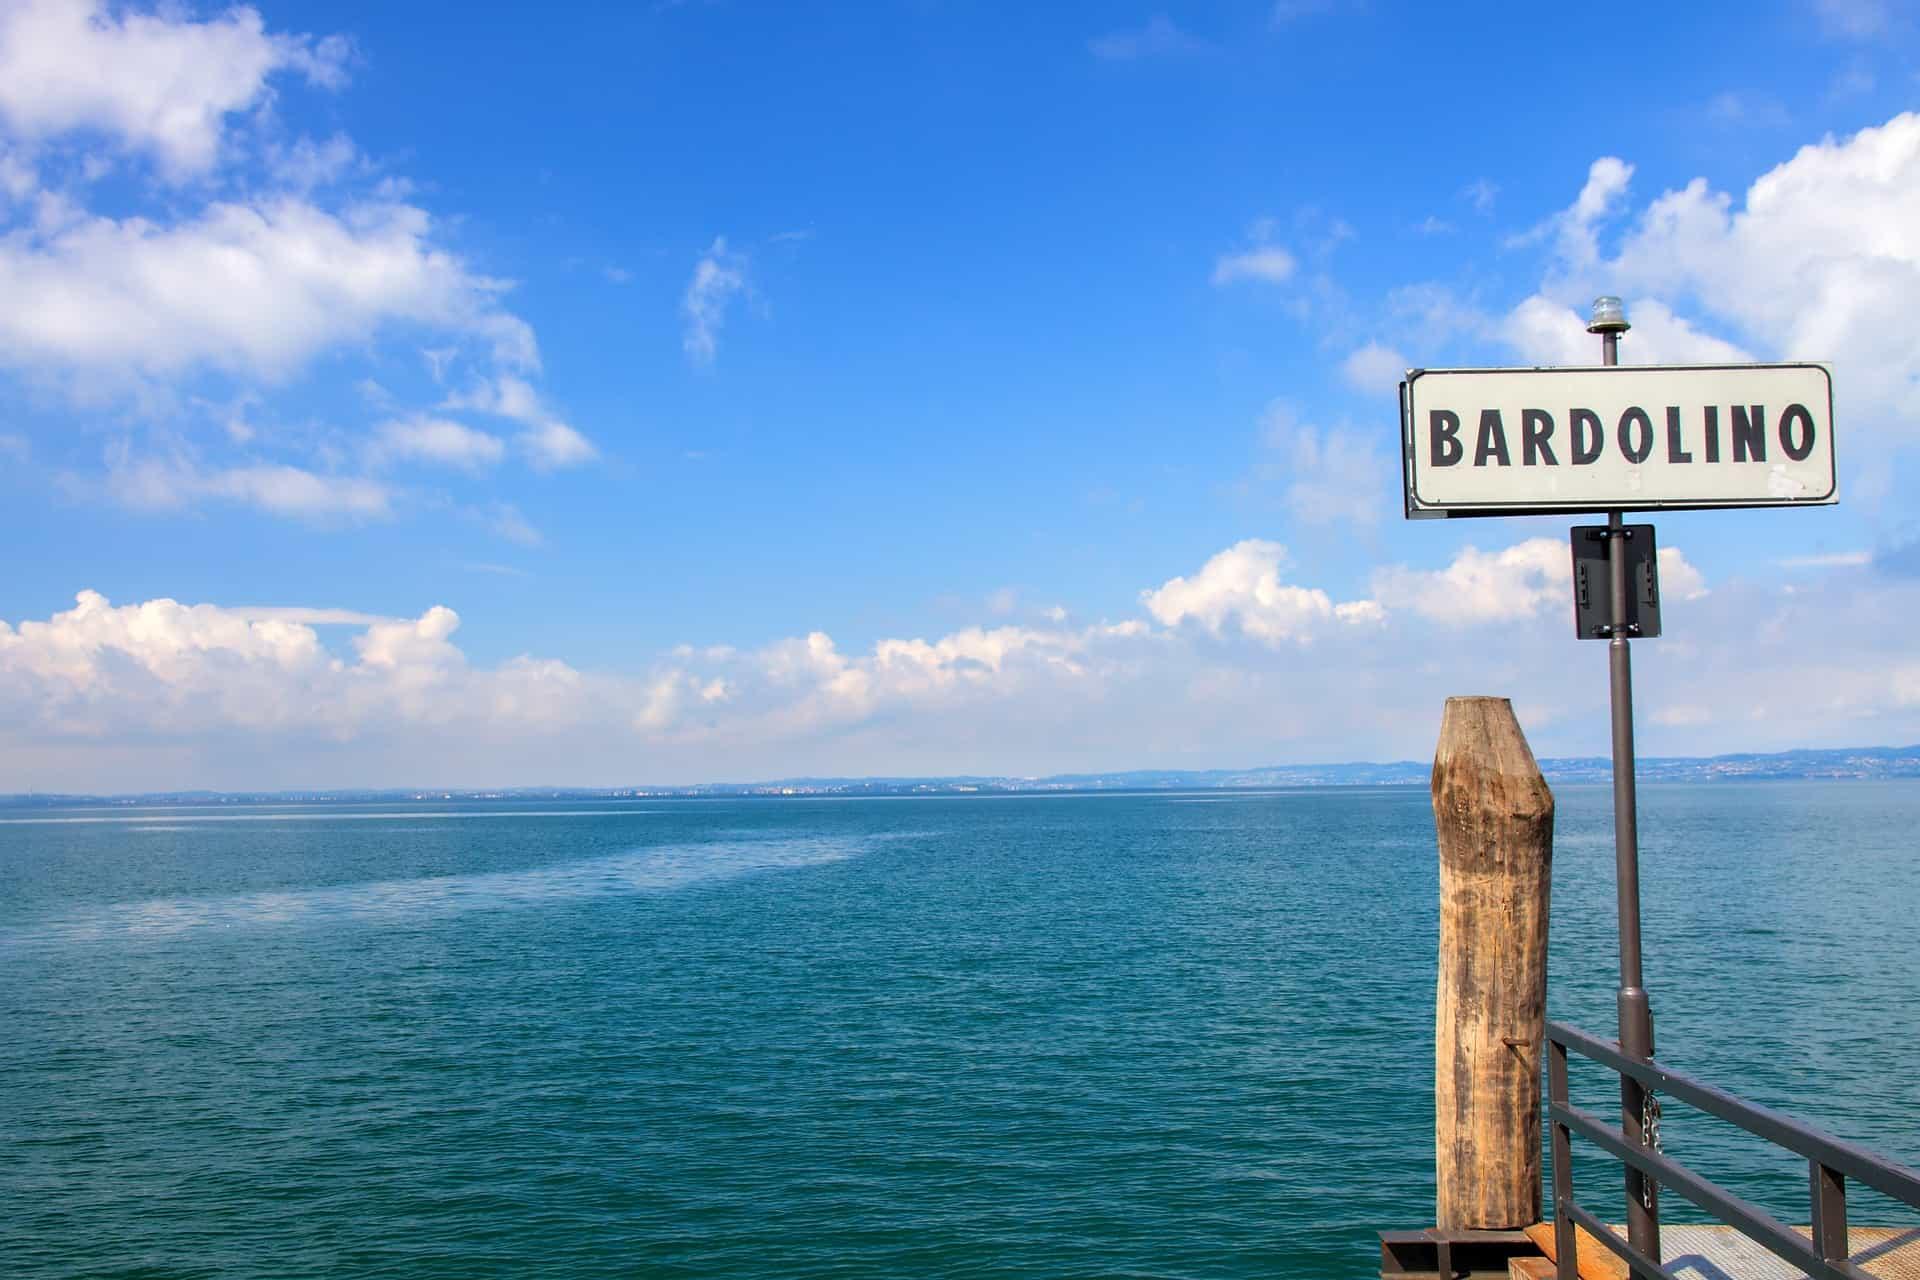 Bardolino Gardasee Top 8 Orte - Camping & Glamping in Italien